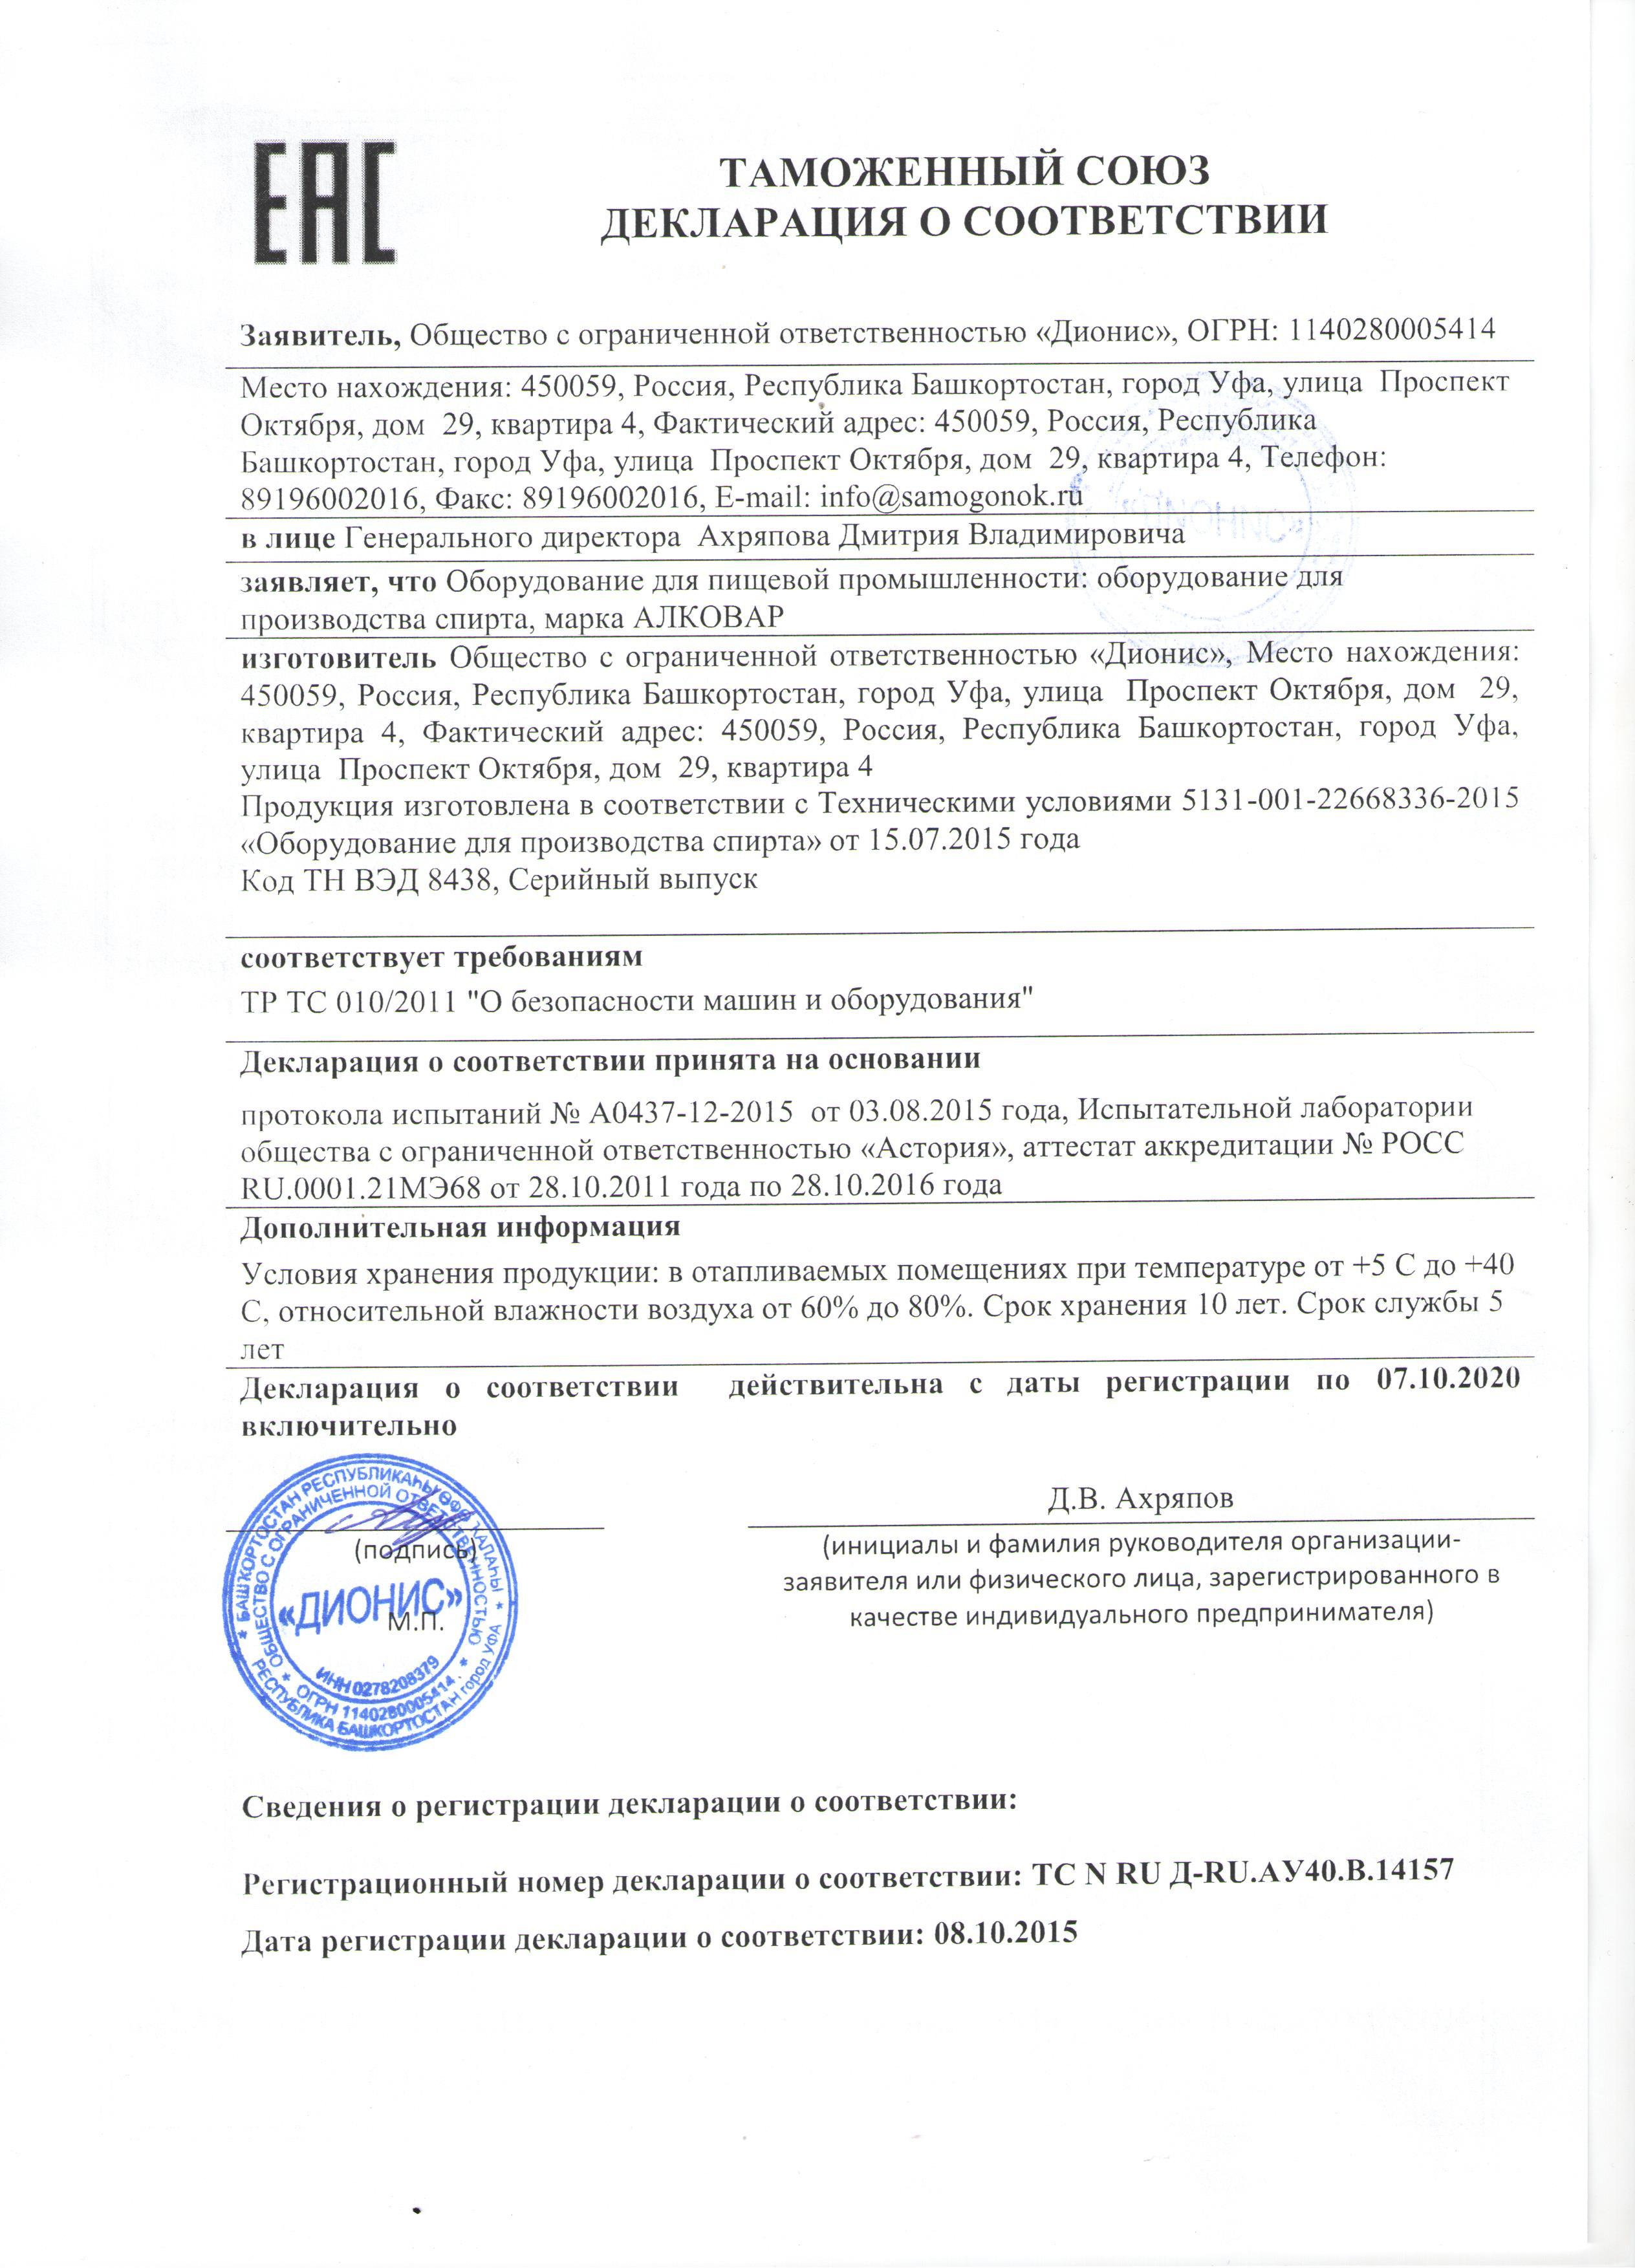 Декларация таможенного союза на все аппараты тм АЛКОВАР